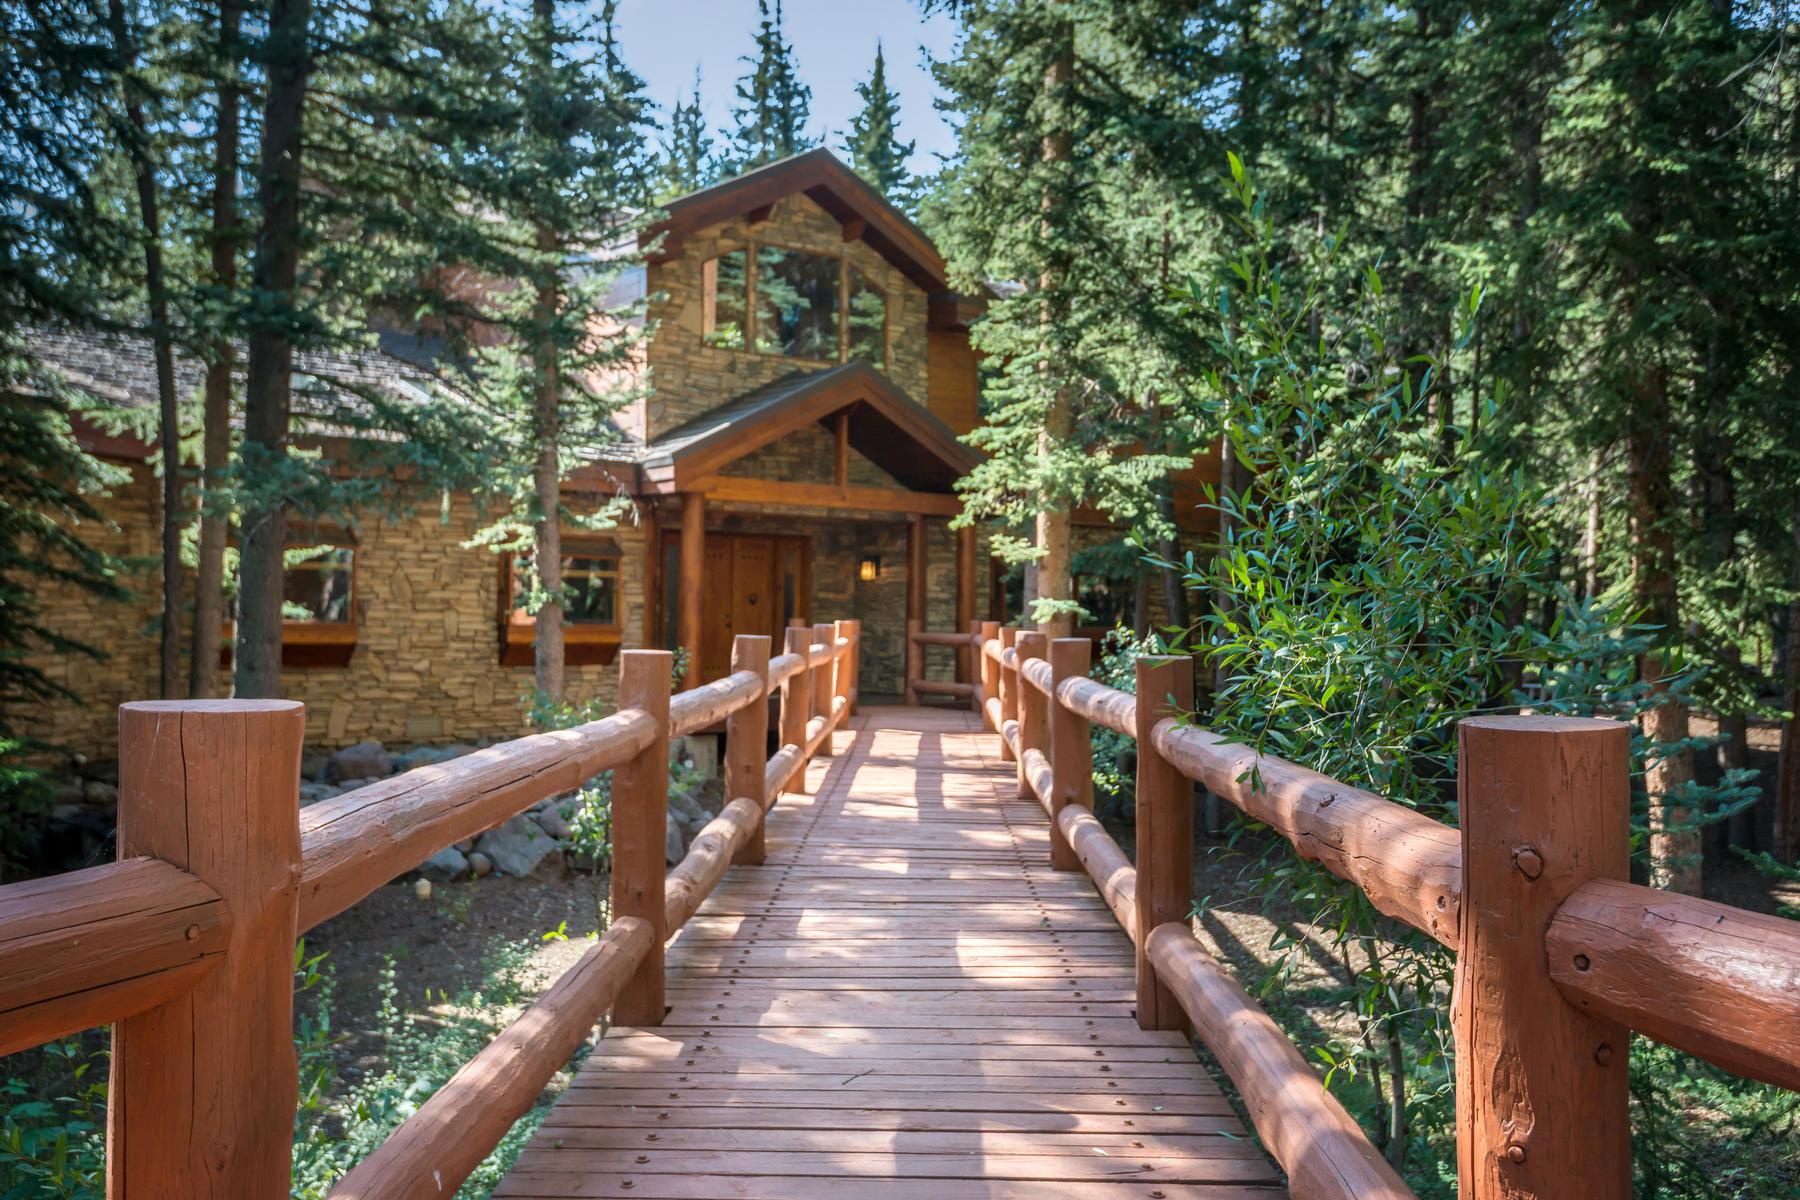 Single Family Homes for Sale at 256 Wagon Train Dr Antonito, Colorado 81120 United States